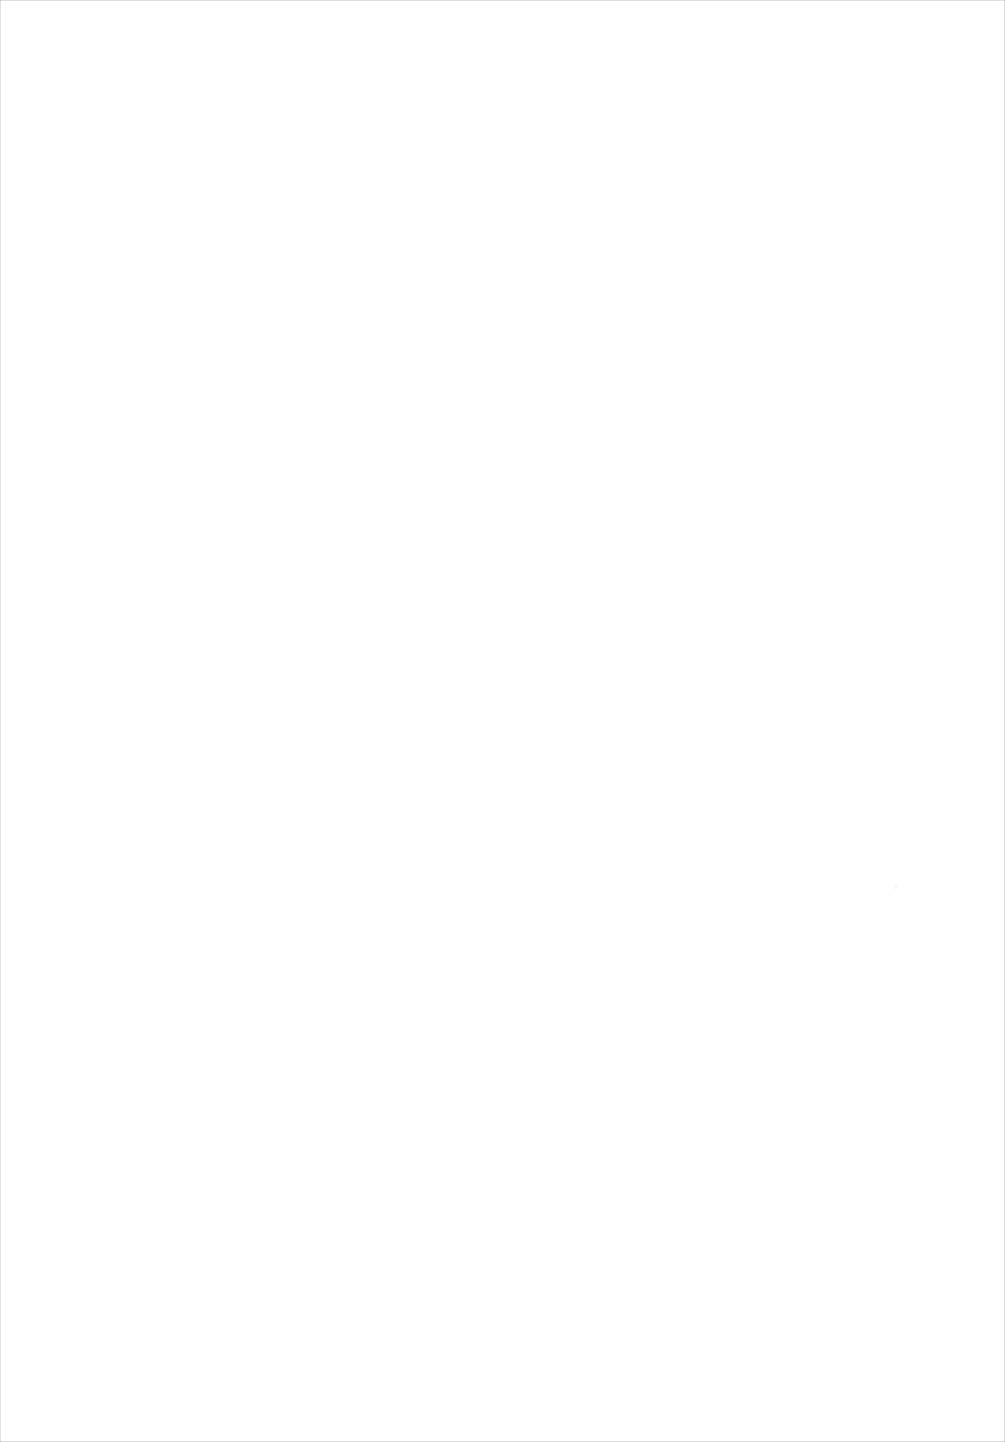 (C93) [Ugokuna pharmacy θ (ababari)] Martina ga Puff-Puff jou no Kawari ni Puff-Puff Shite Kureru Hon (Dragon Quest XI) 1